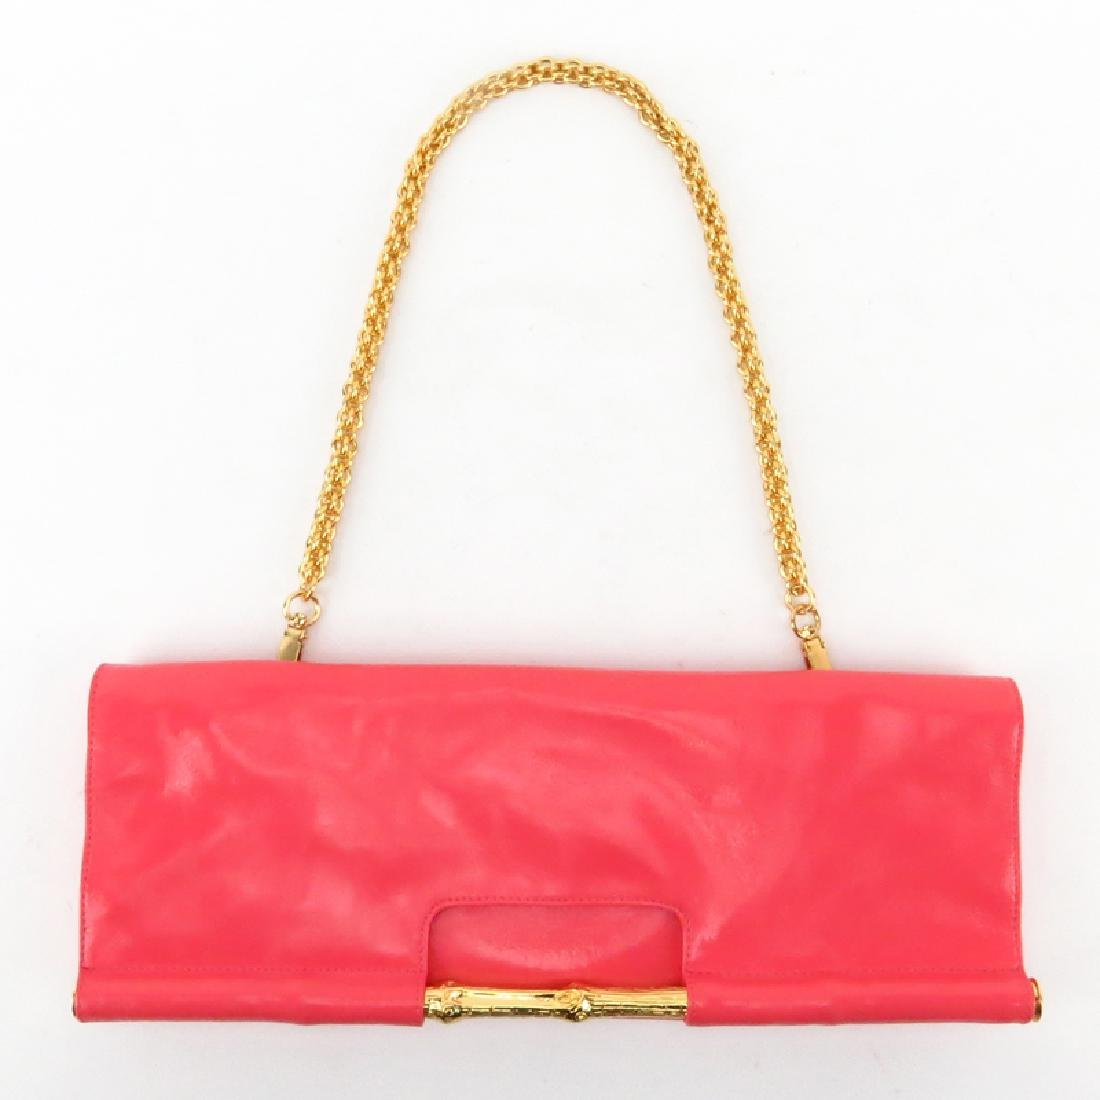 Trina Turk Salmon Pink Patent Leather Clutch